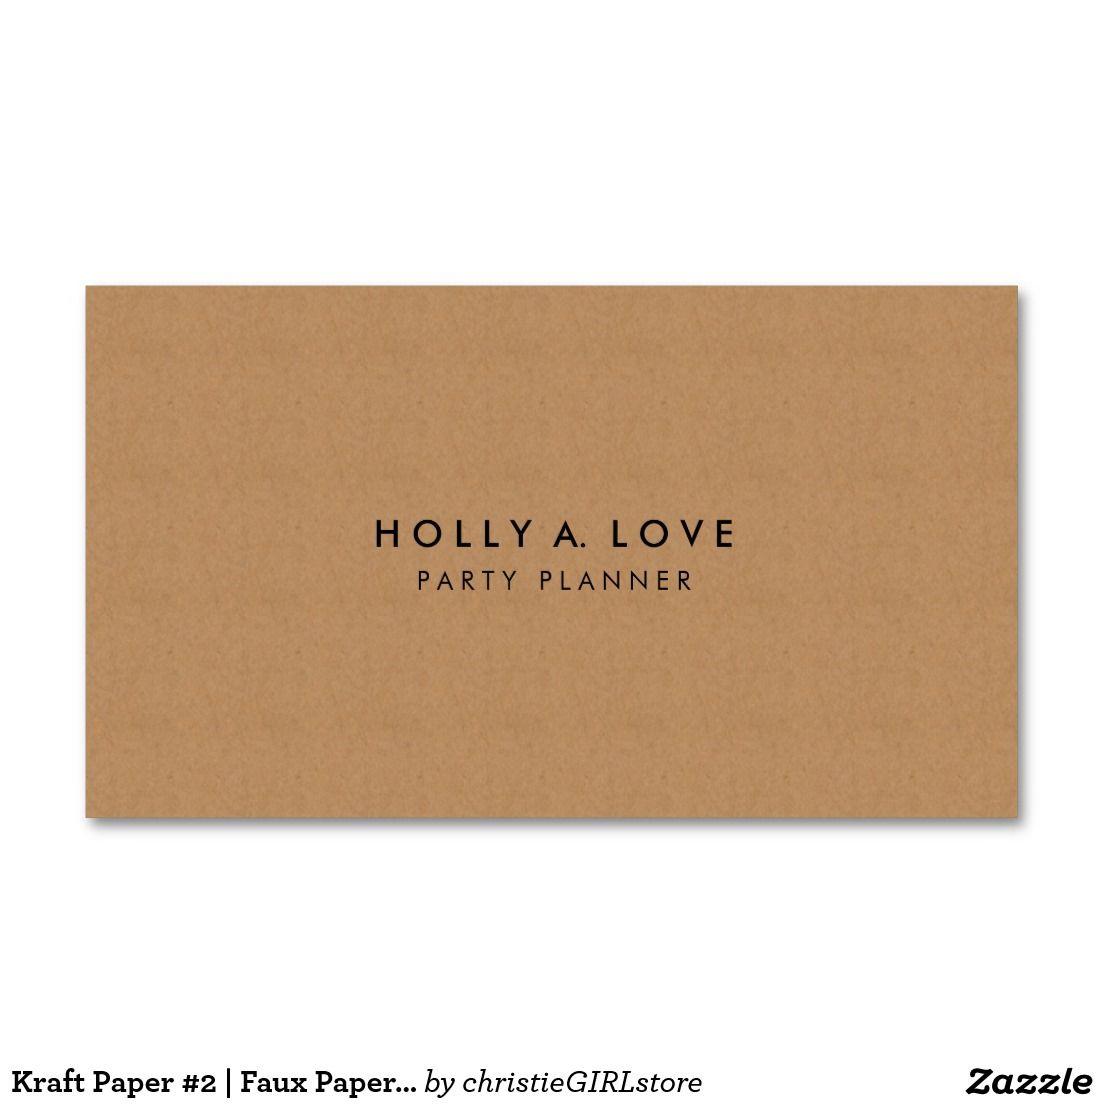 Kraft Paper 2 Faux Paper Texture Customizable Business Card Zazzle Com Paper Texture Customizable Business Cards Kraft Paper